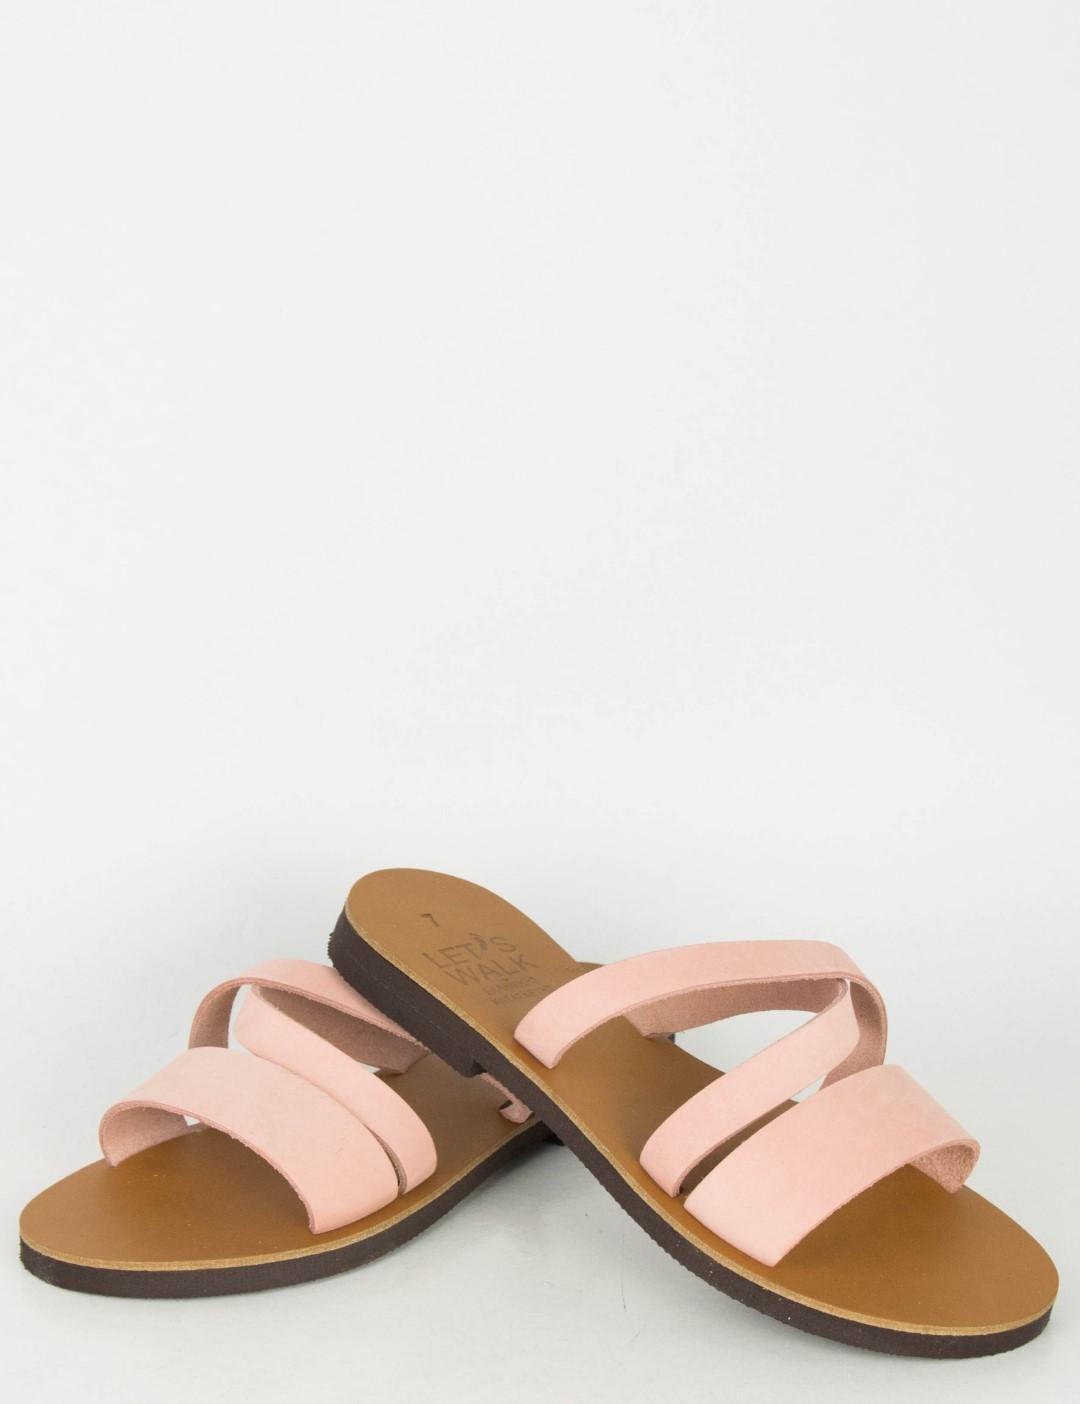 9312e9c0a1a Γυναικεία ροζ Flat πέδιλα λουράκια 041041R   Fashion Voucher